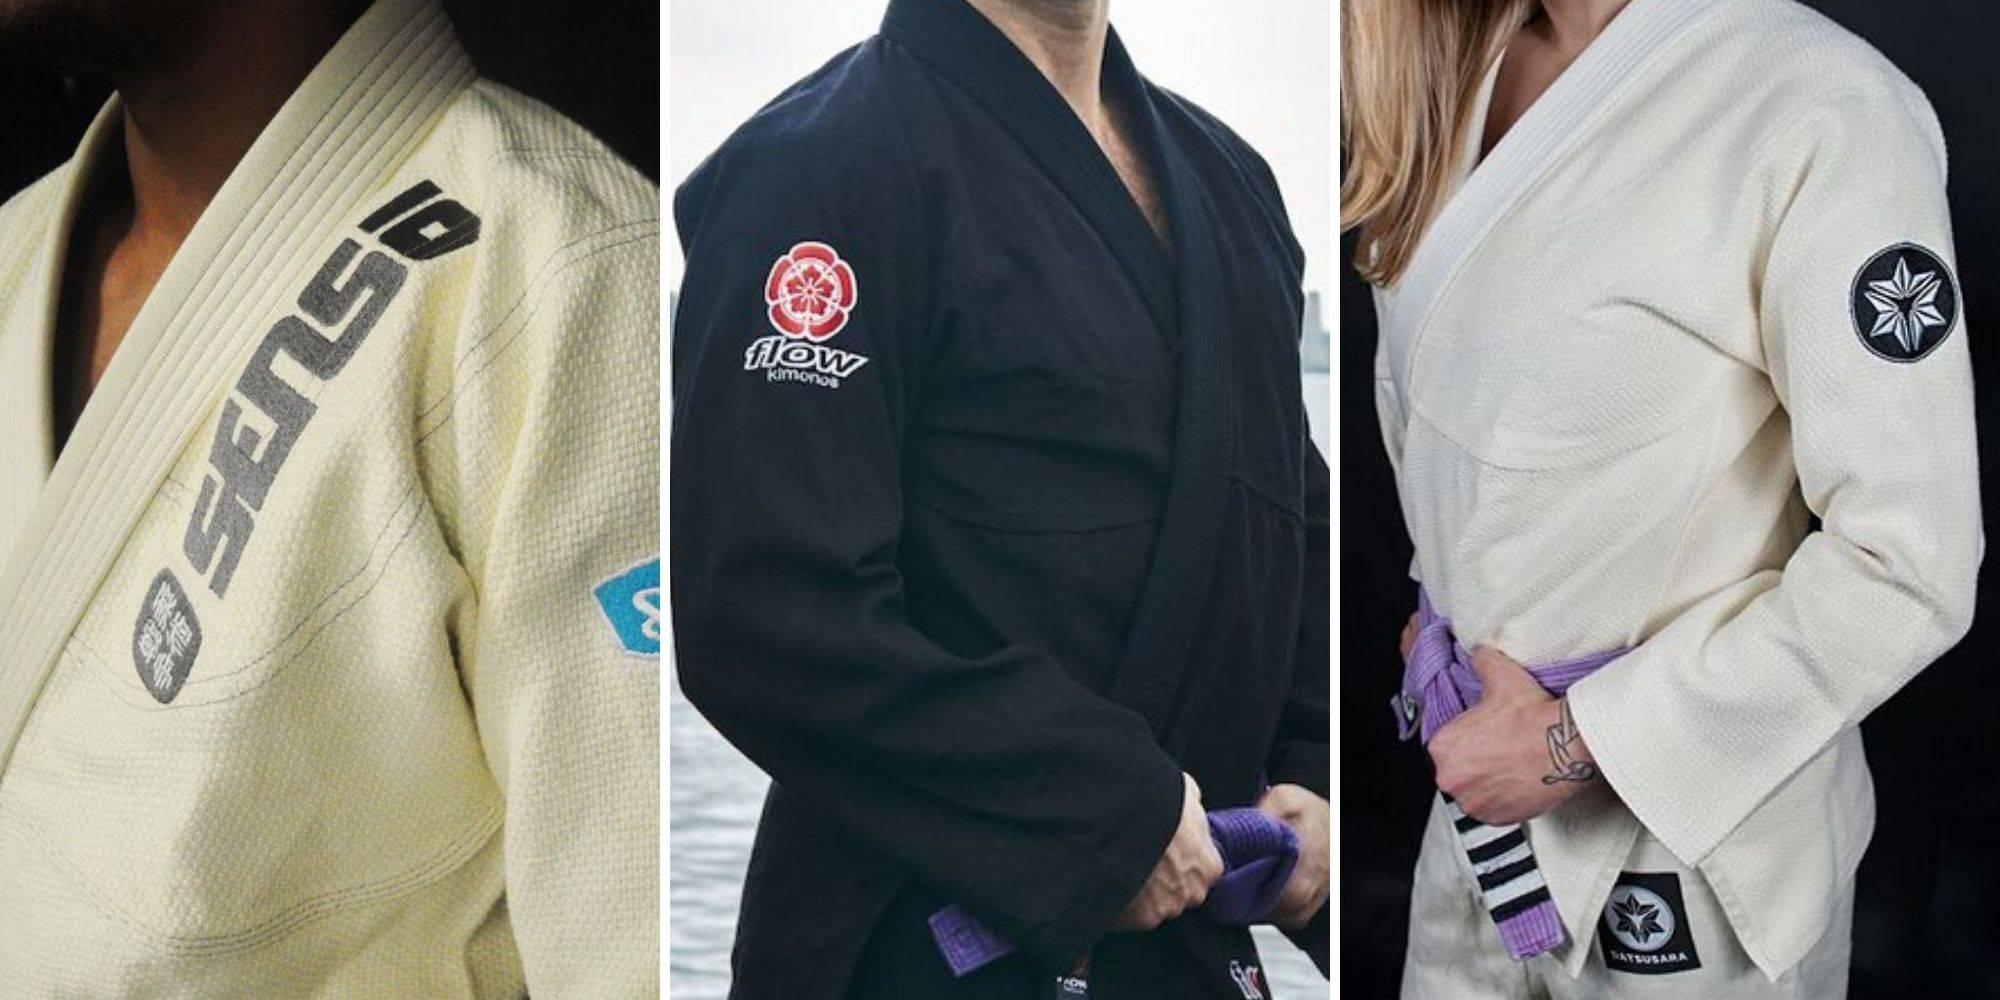 Various Hemp Gi Brands Being Modeled